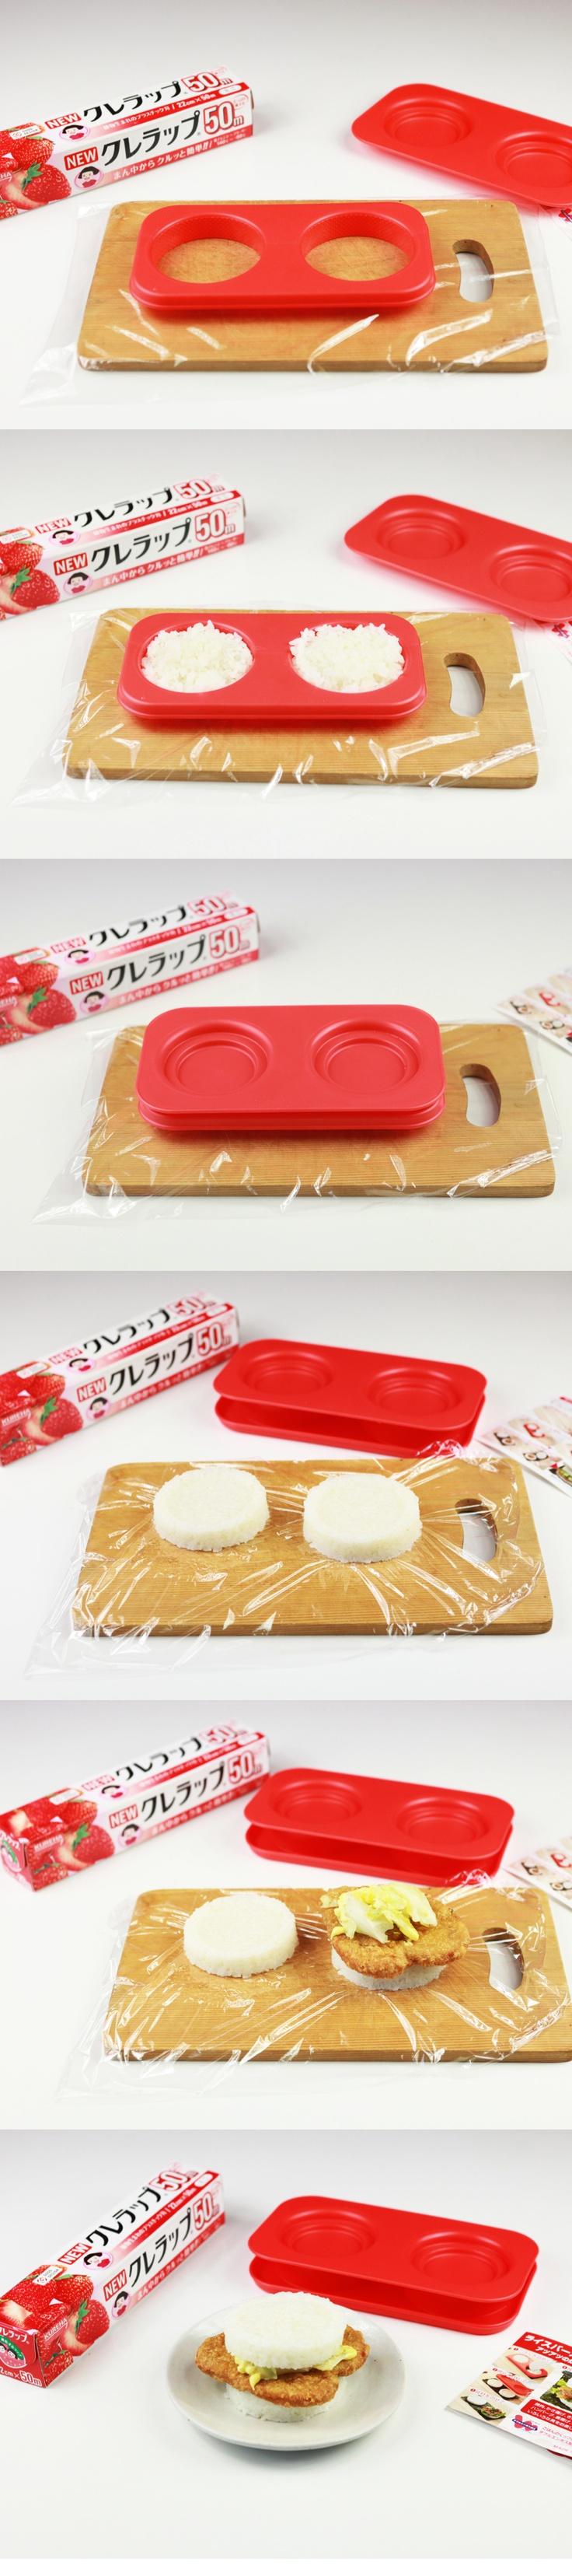 Rice Burger Maker on Bento http://en.bentoandco.com/products/rice-burger-maker